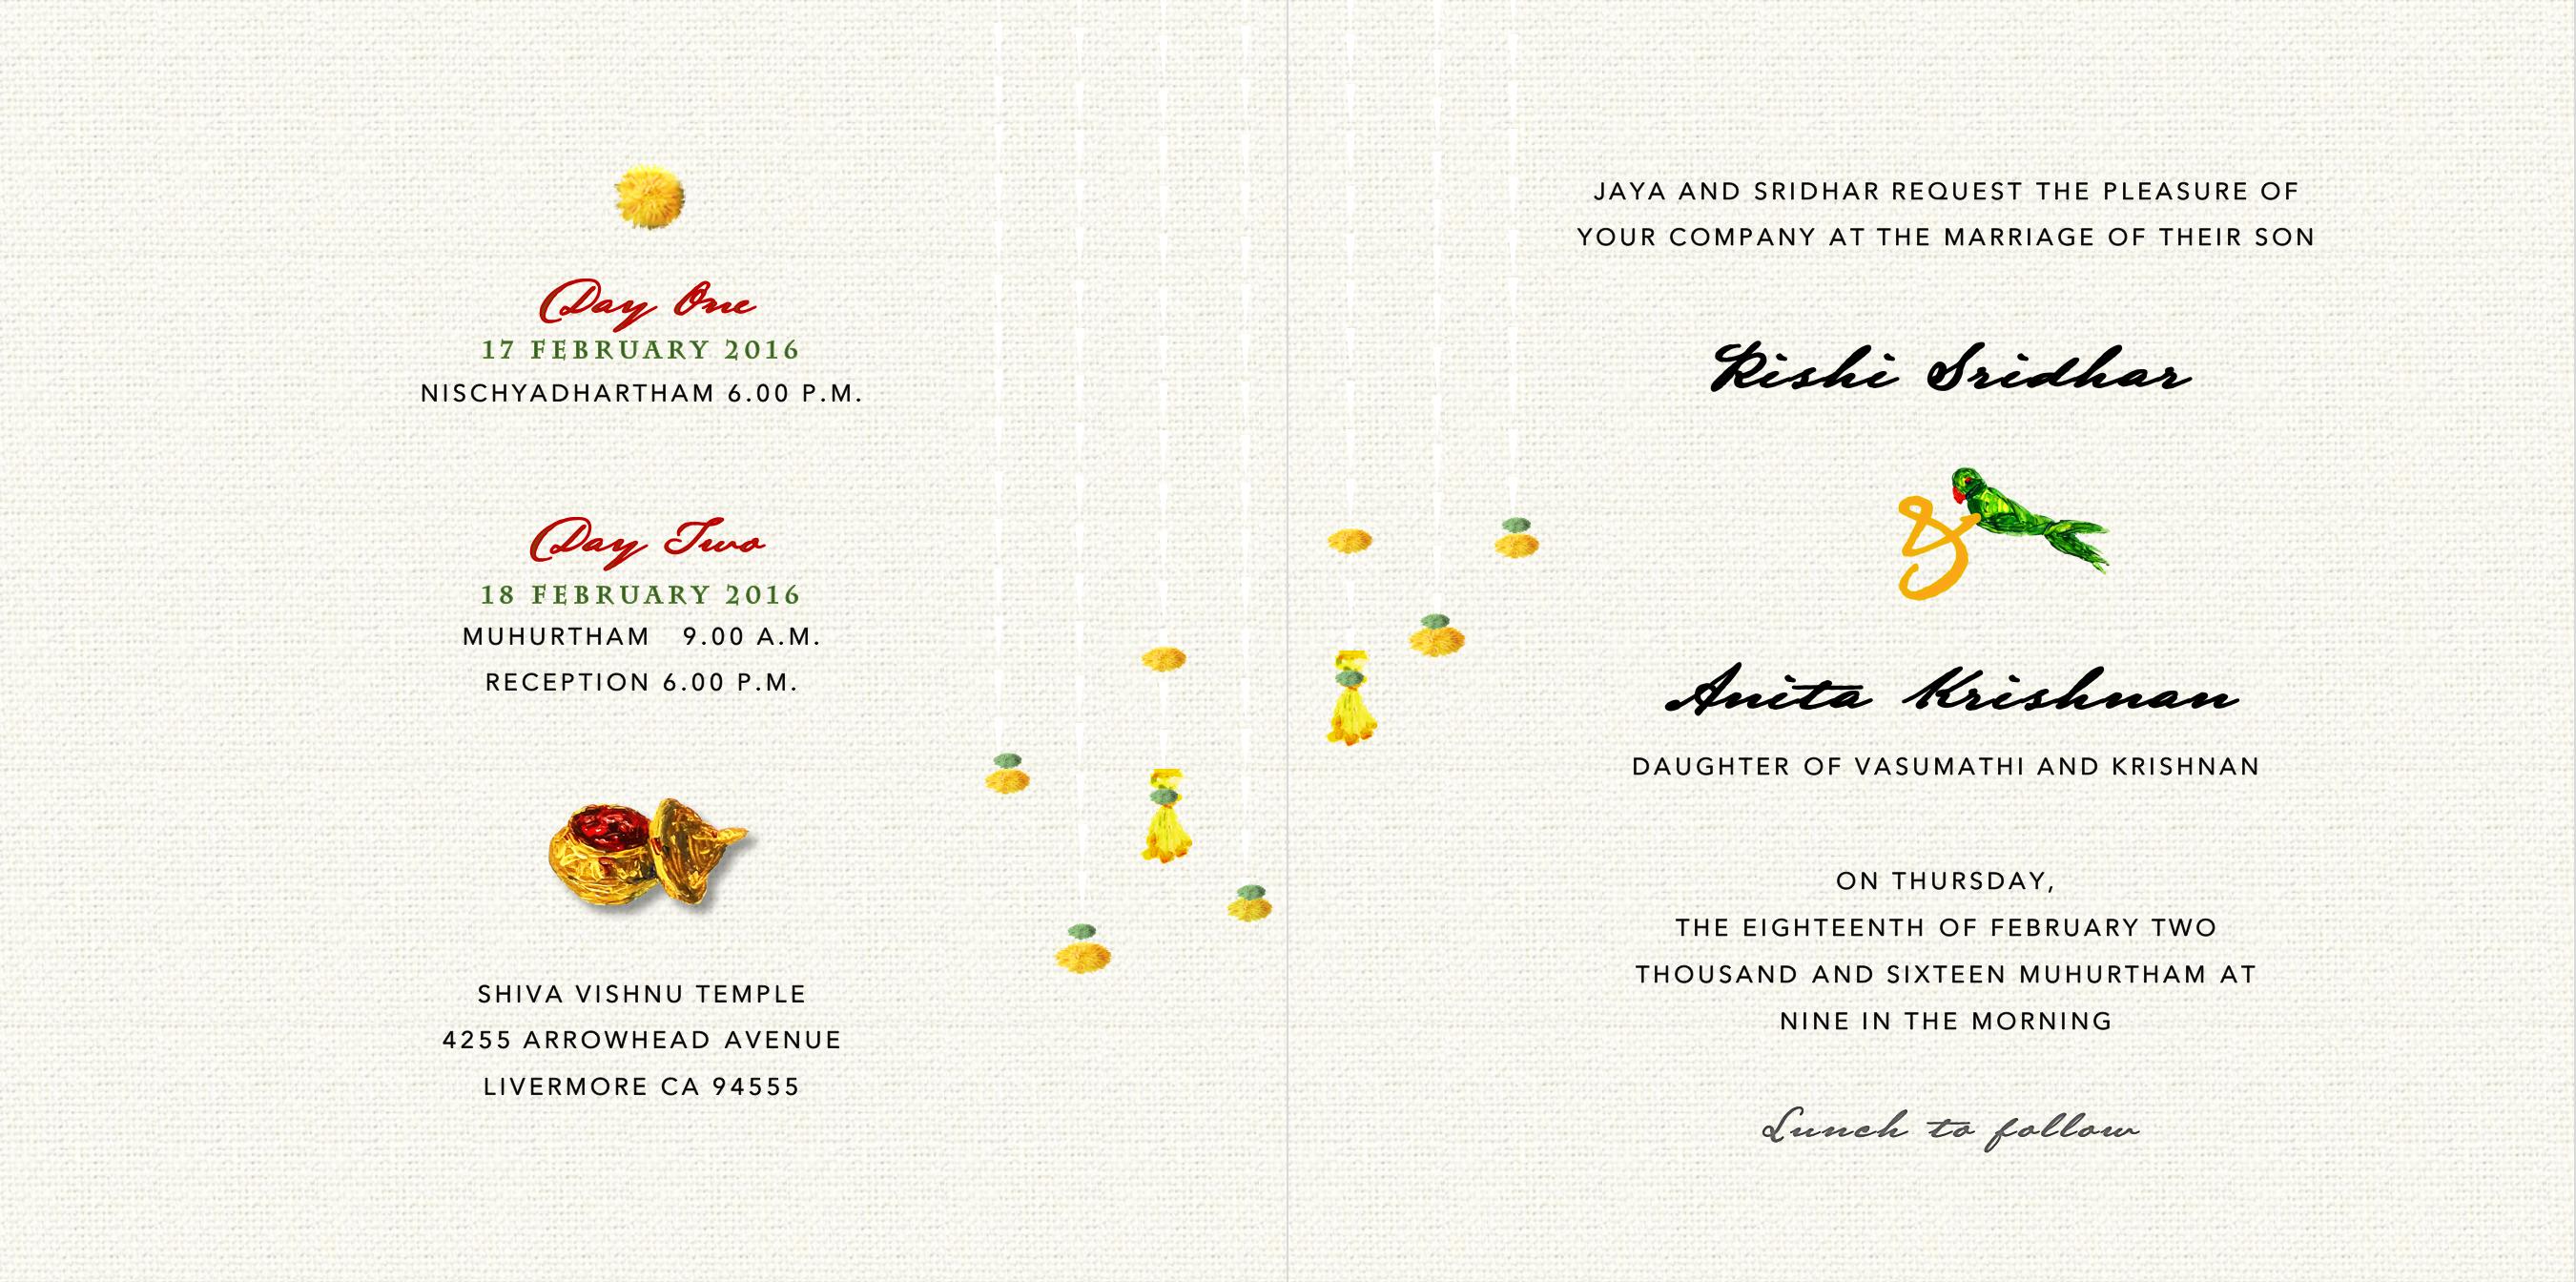 Sametha S South Indian Wedding Invitation Card Inside Indian